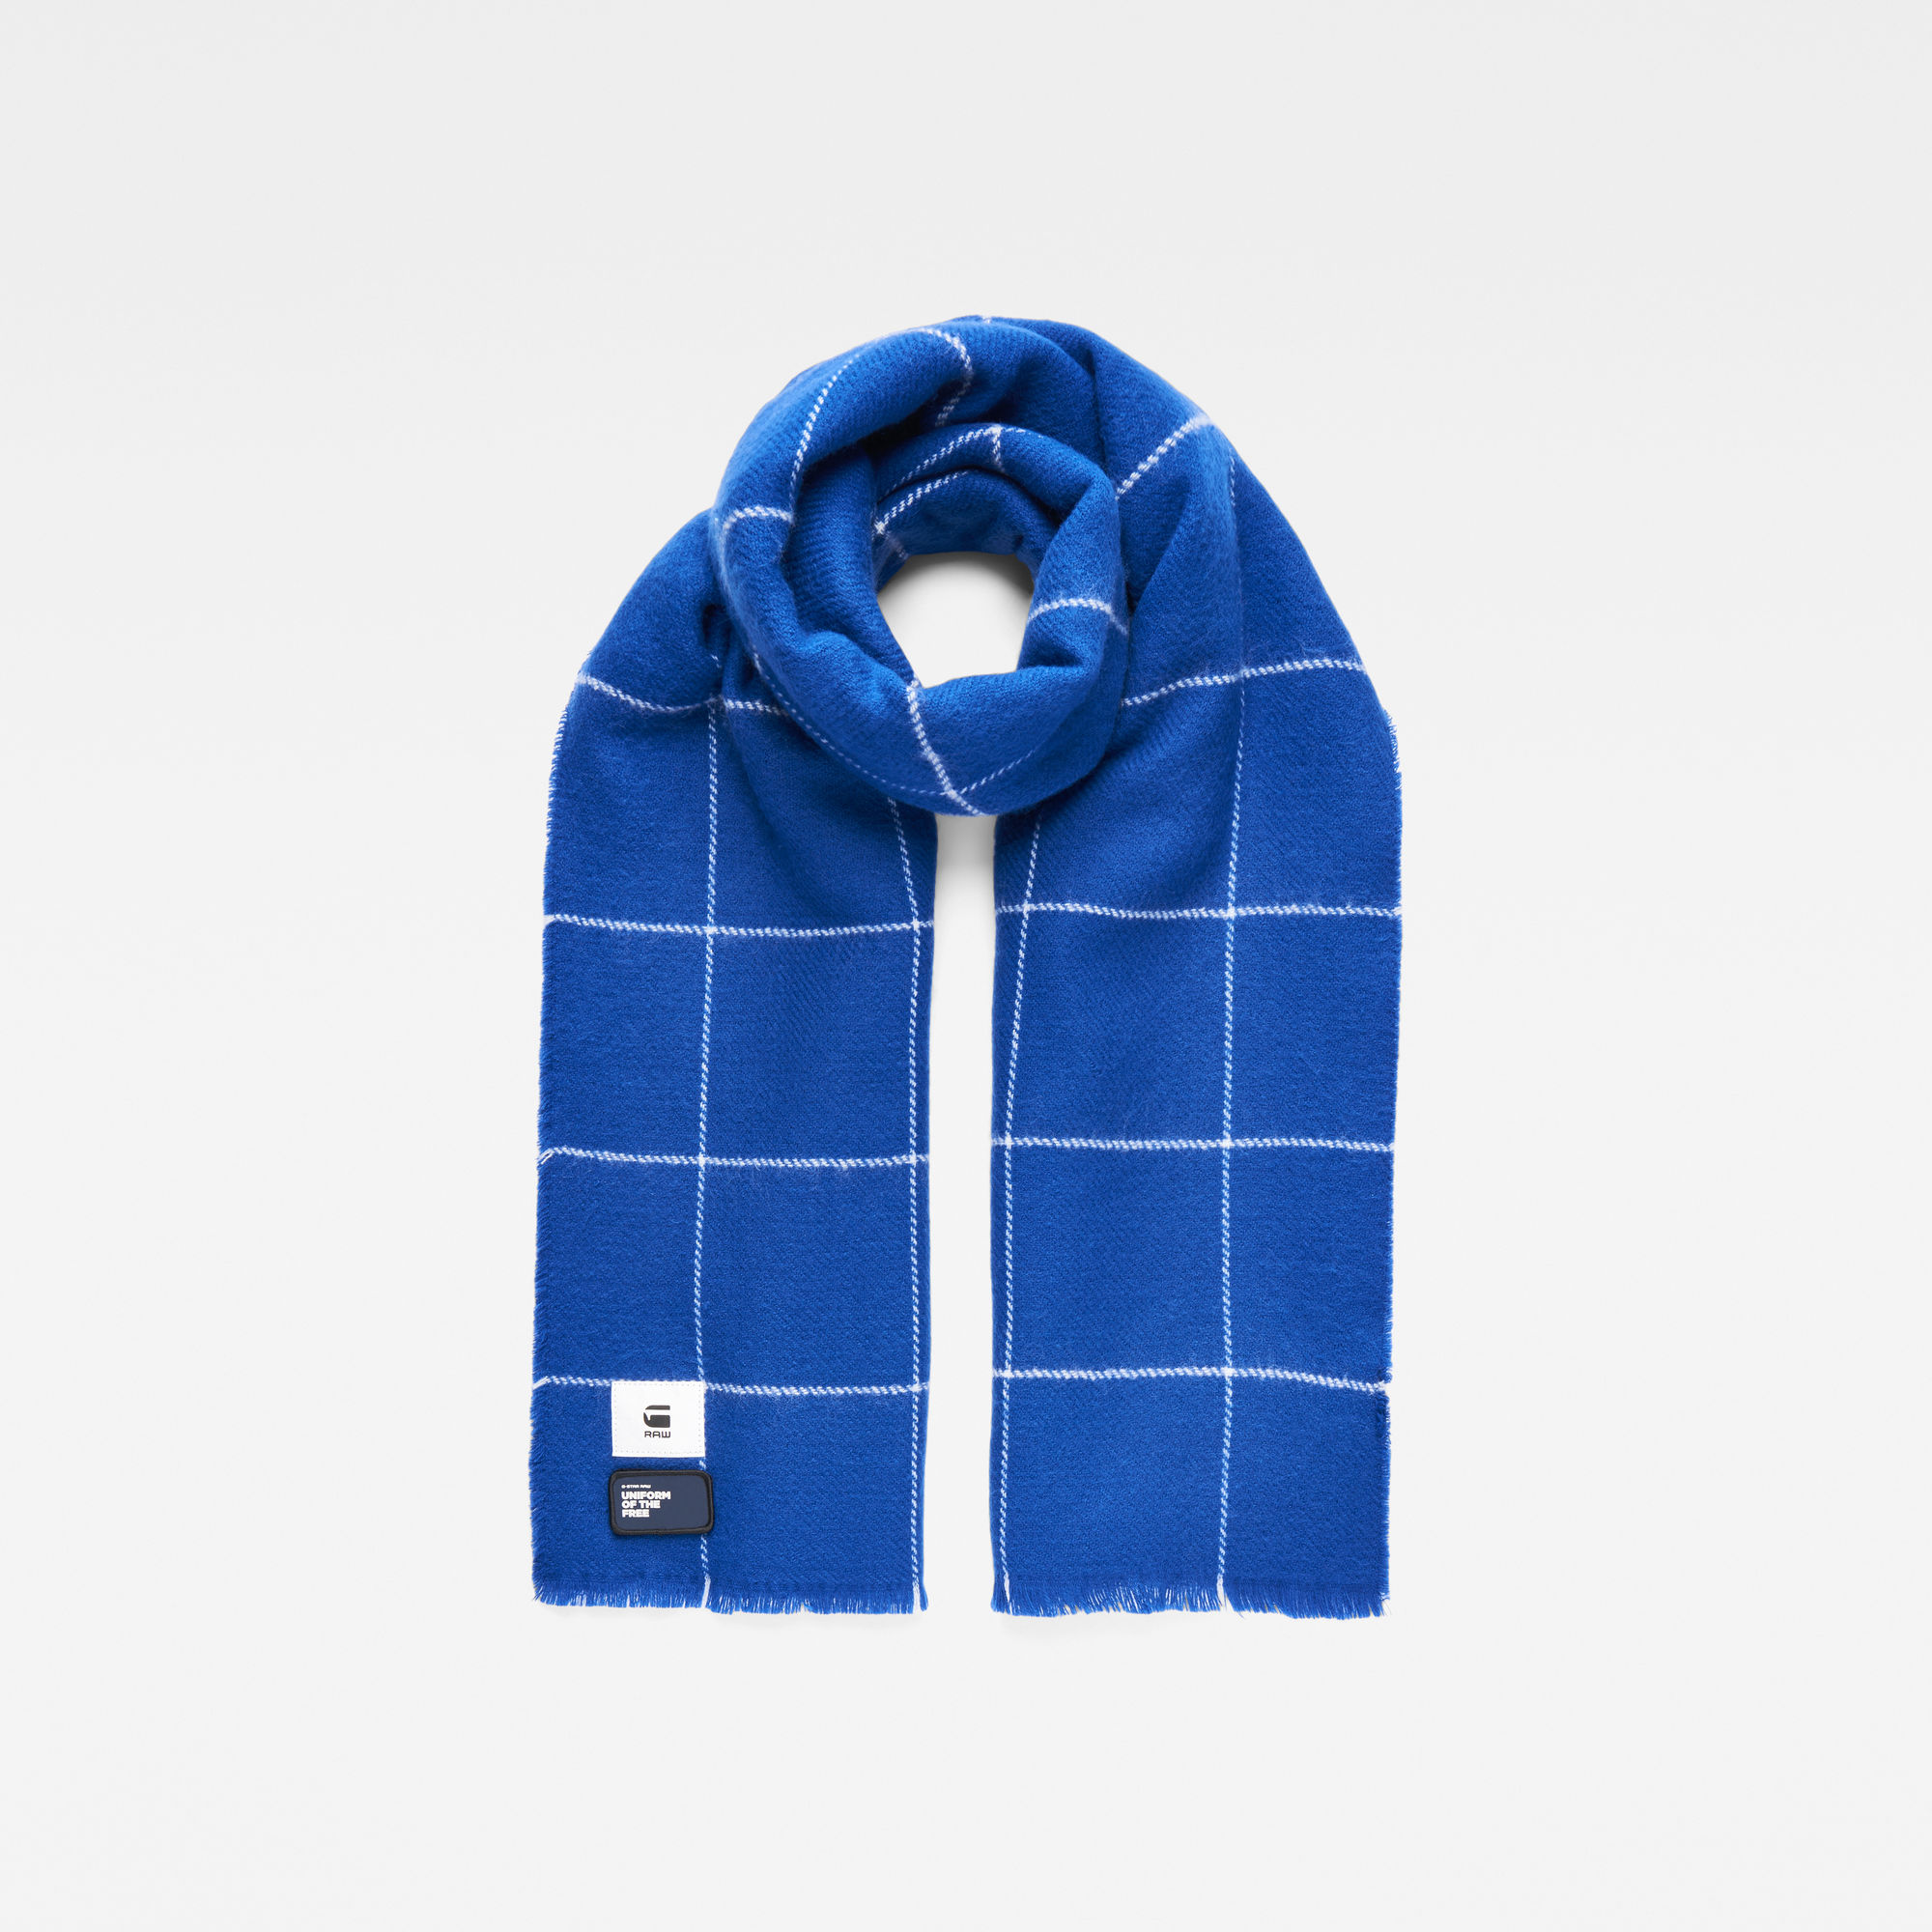 Dorala scarf